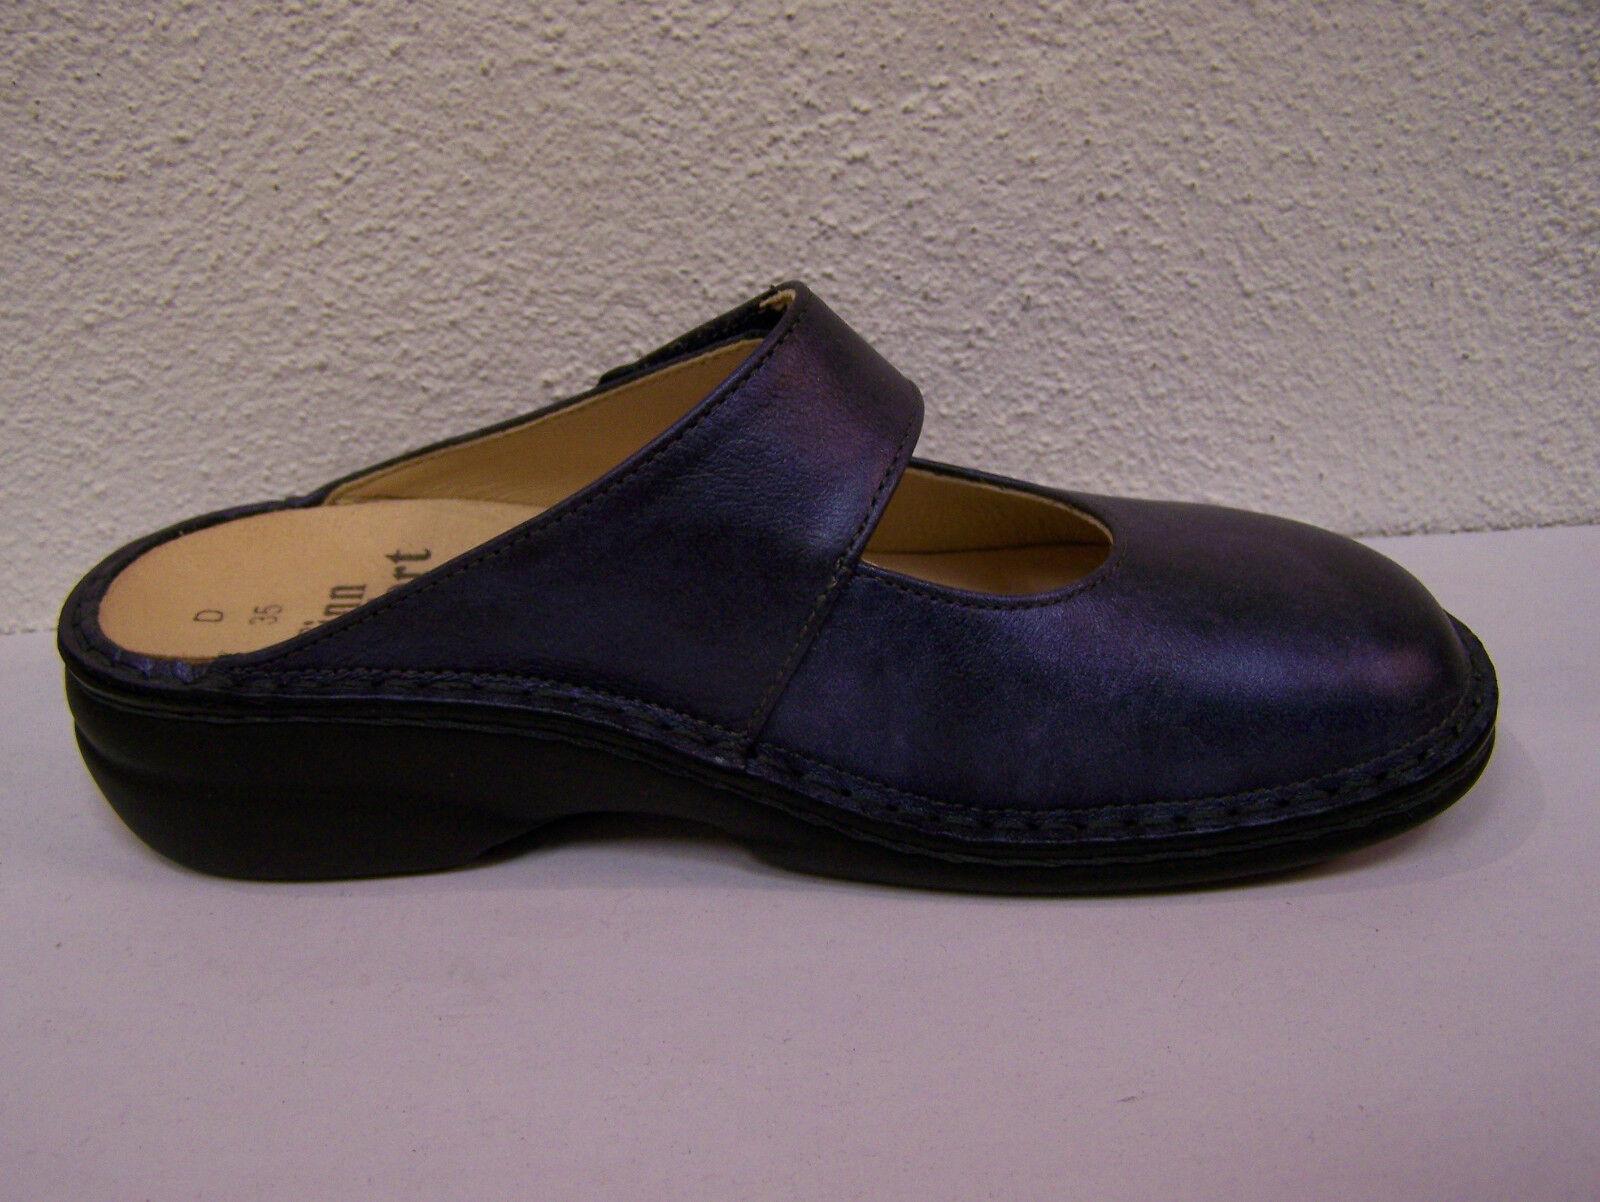 Finn Comfort Stanford Schuhbeutel blau metallic incl. Baumwoll Schuhbeutel Stanford Wechselfußbett 1d76b4